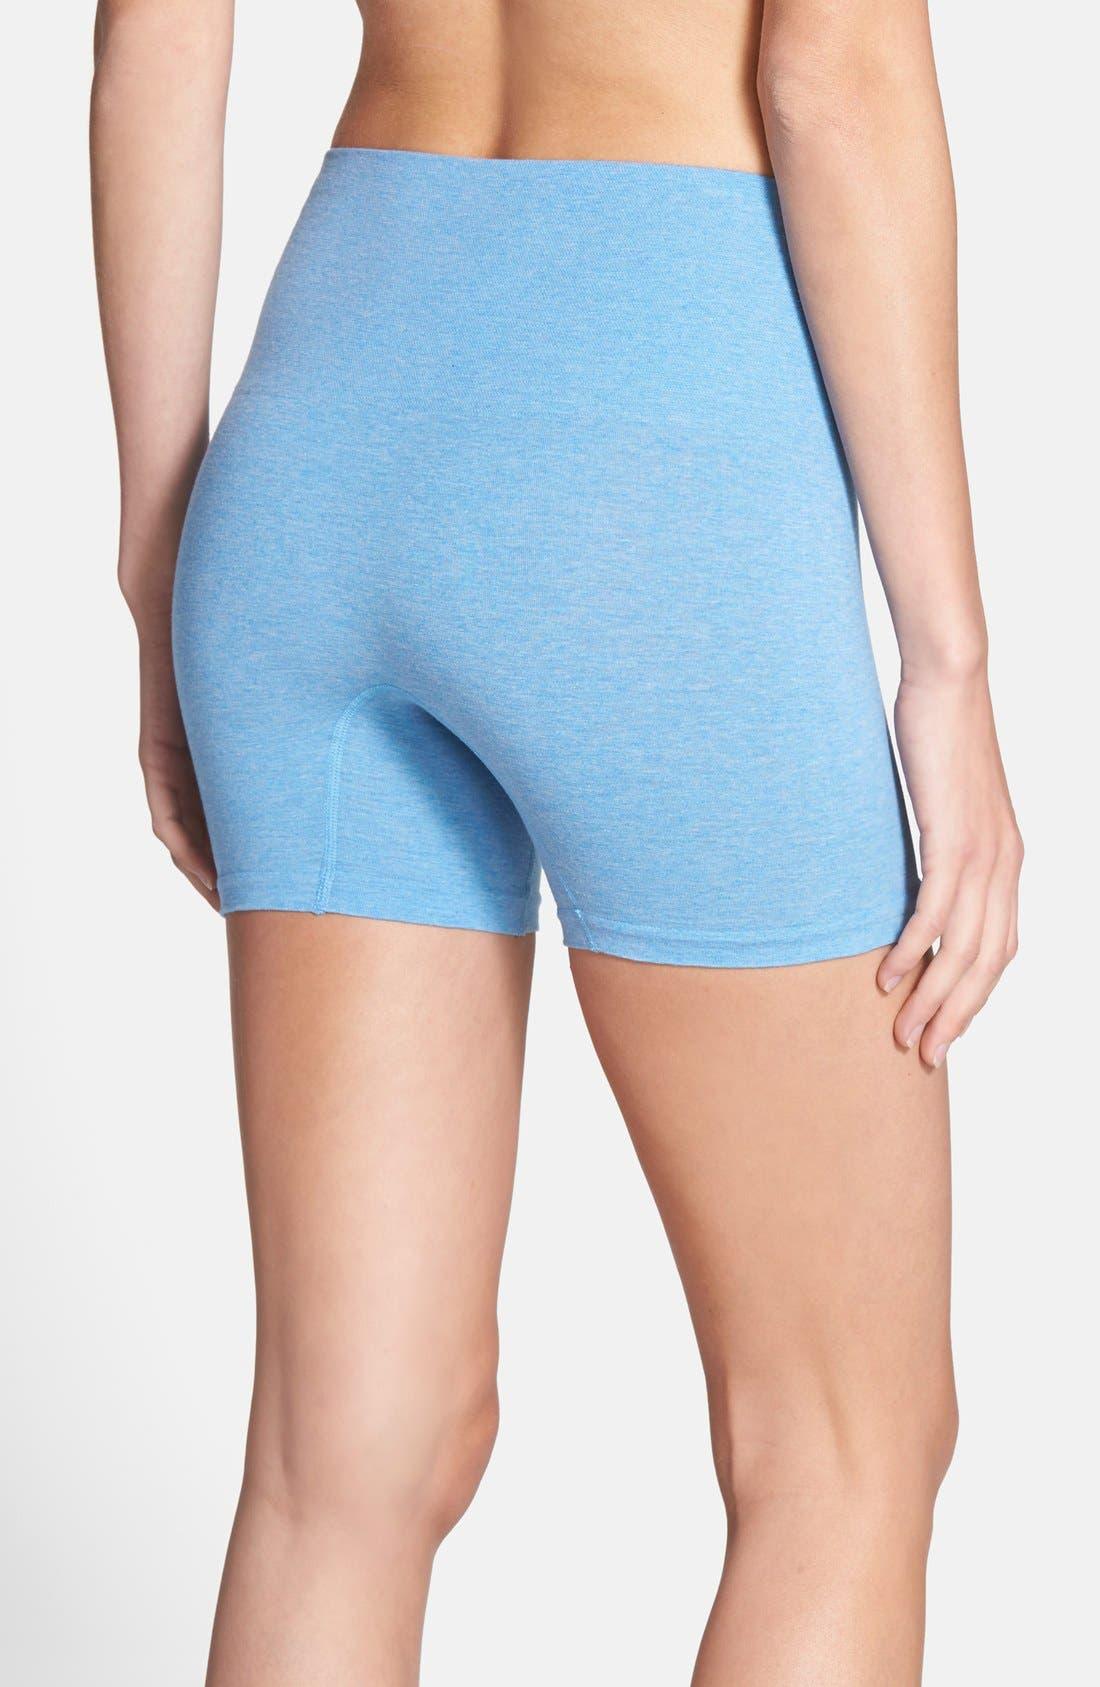 Alternate Image 2  - Yummie 'Tina' Shaping Shorts (2 for $30)